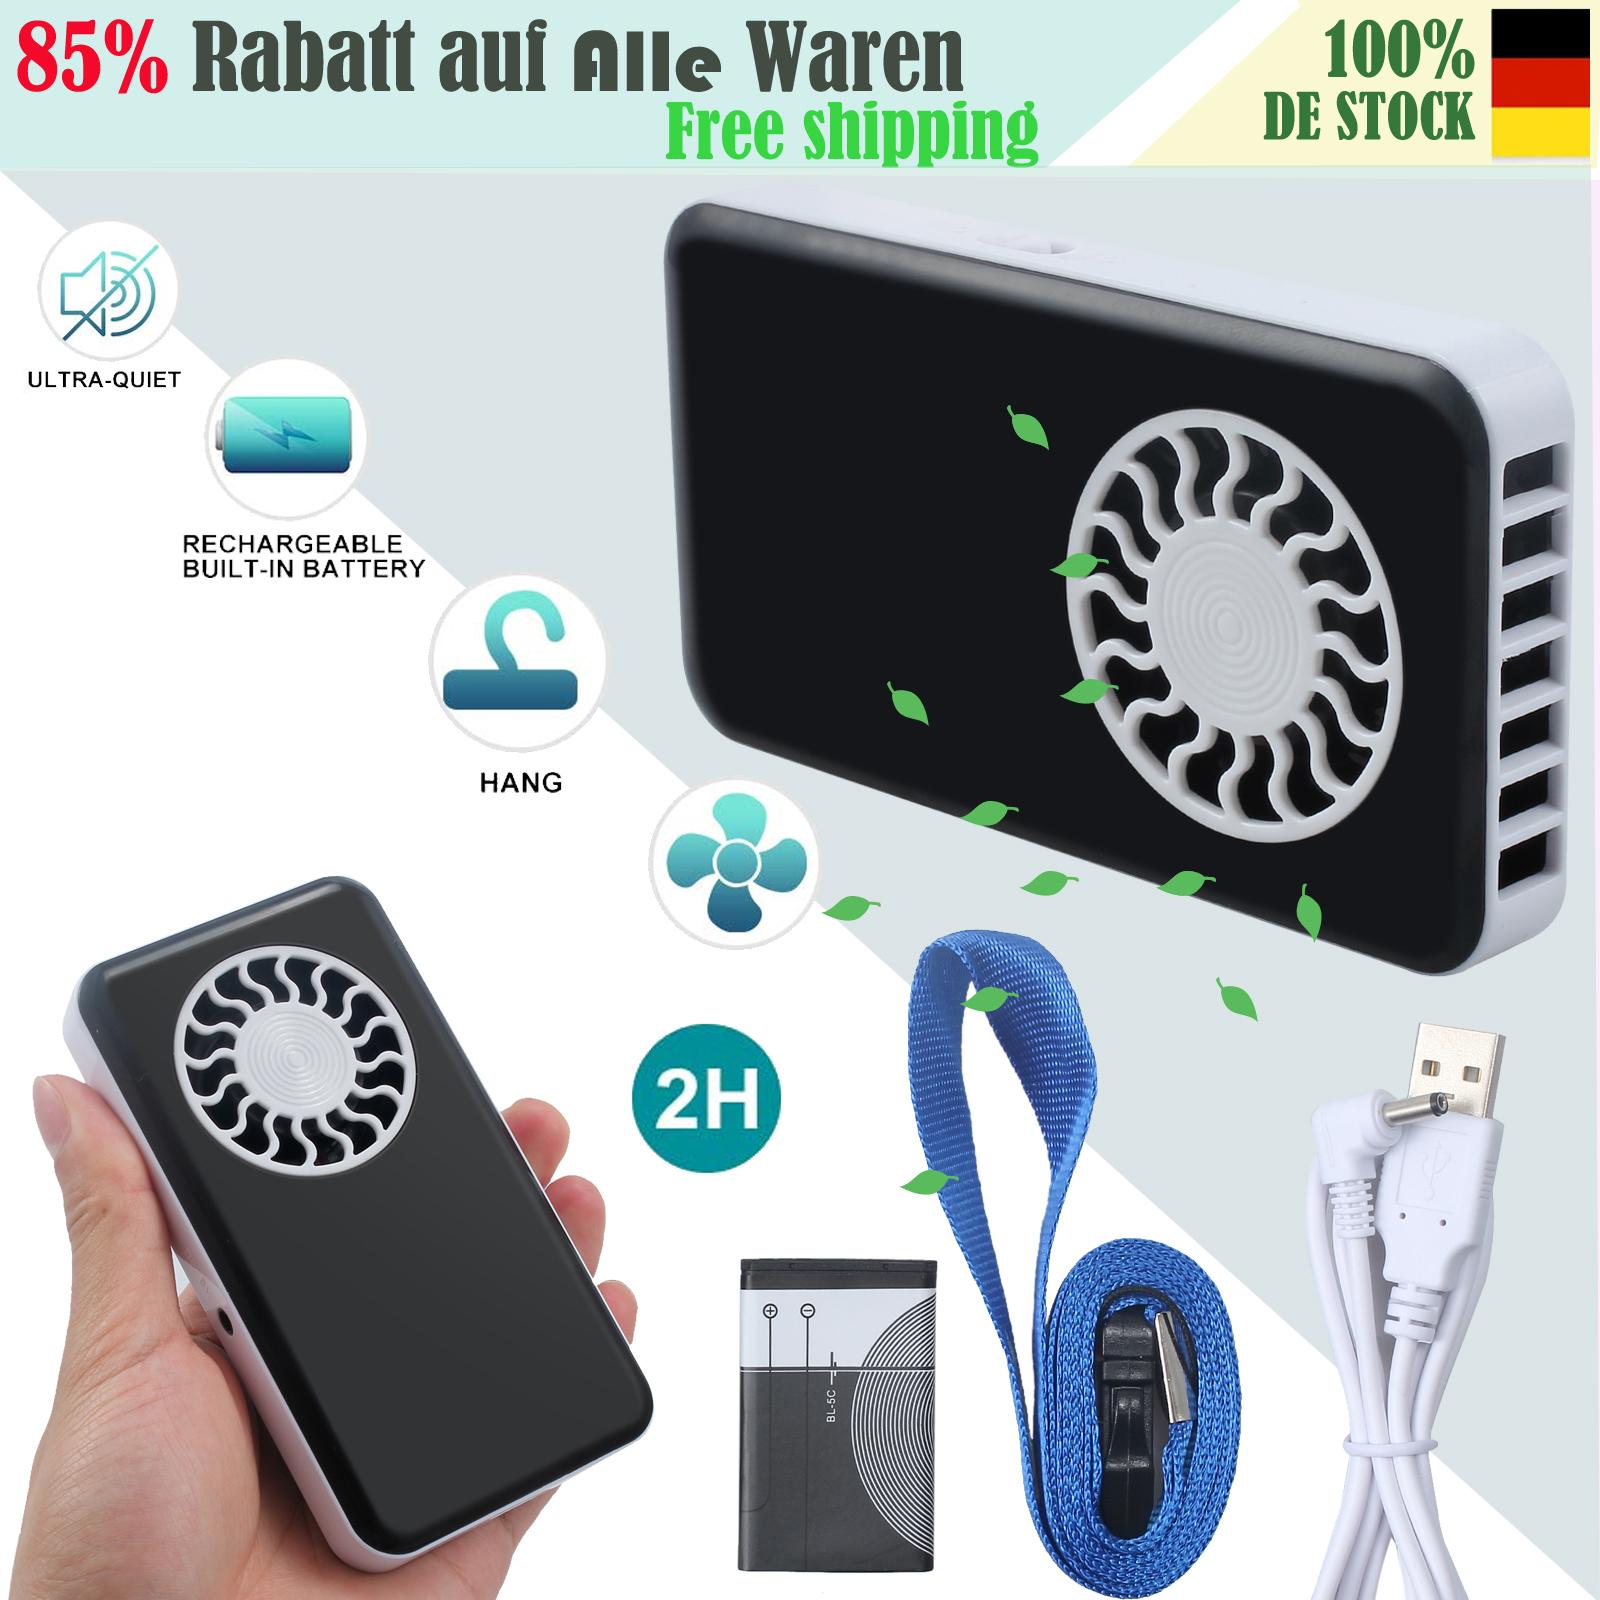 Mini Handheld Ventilator USB-Lüfter Tragbare Tischlüfter Handlüfter für